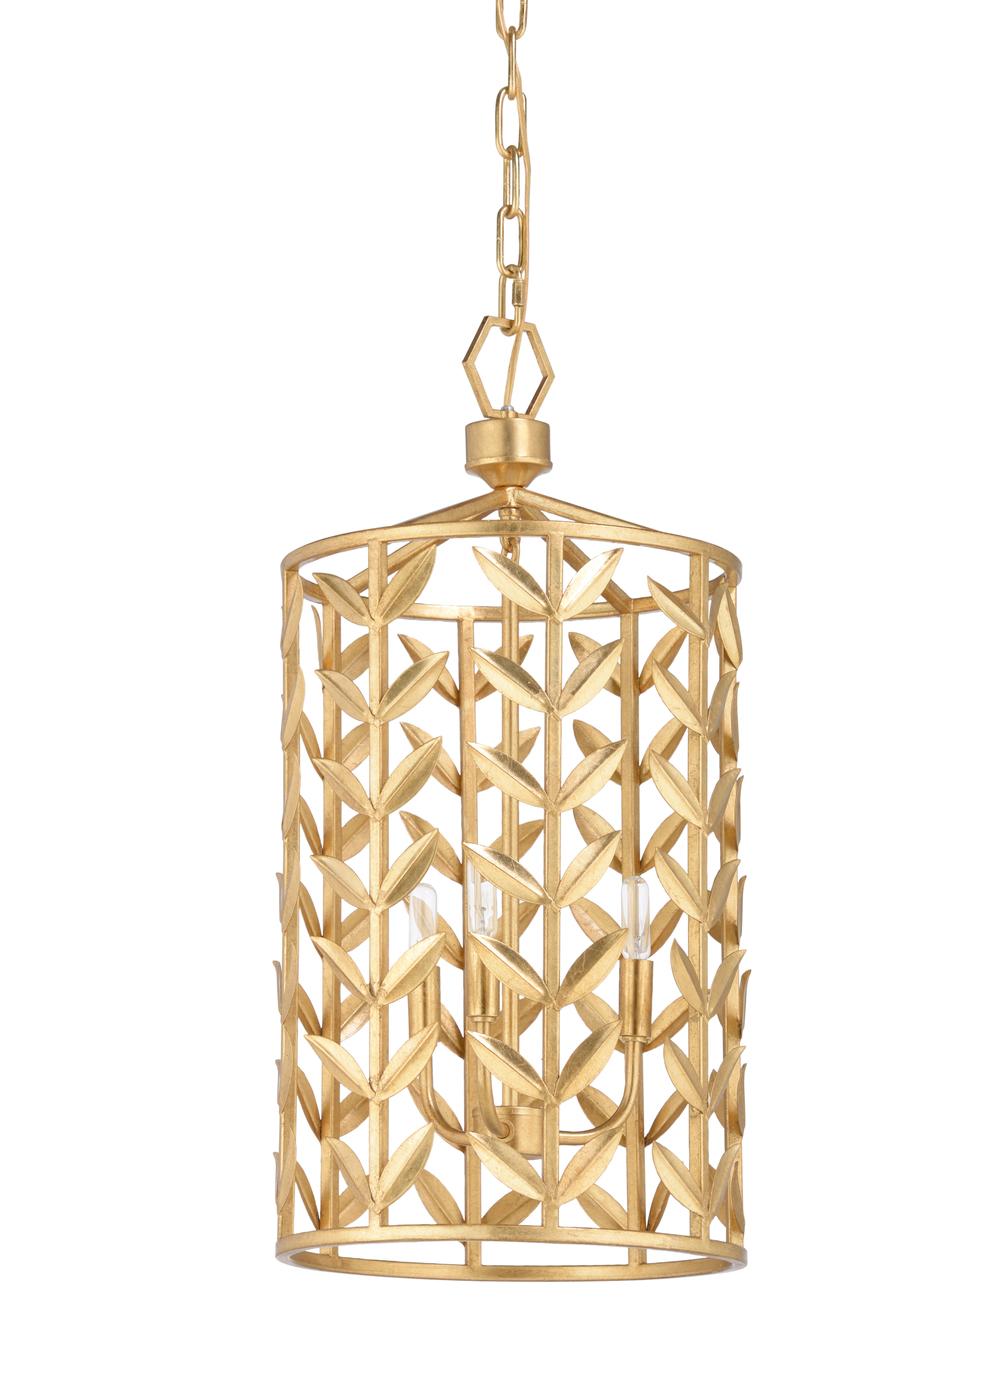 Chelsea House - Stem Lantern